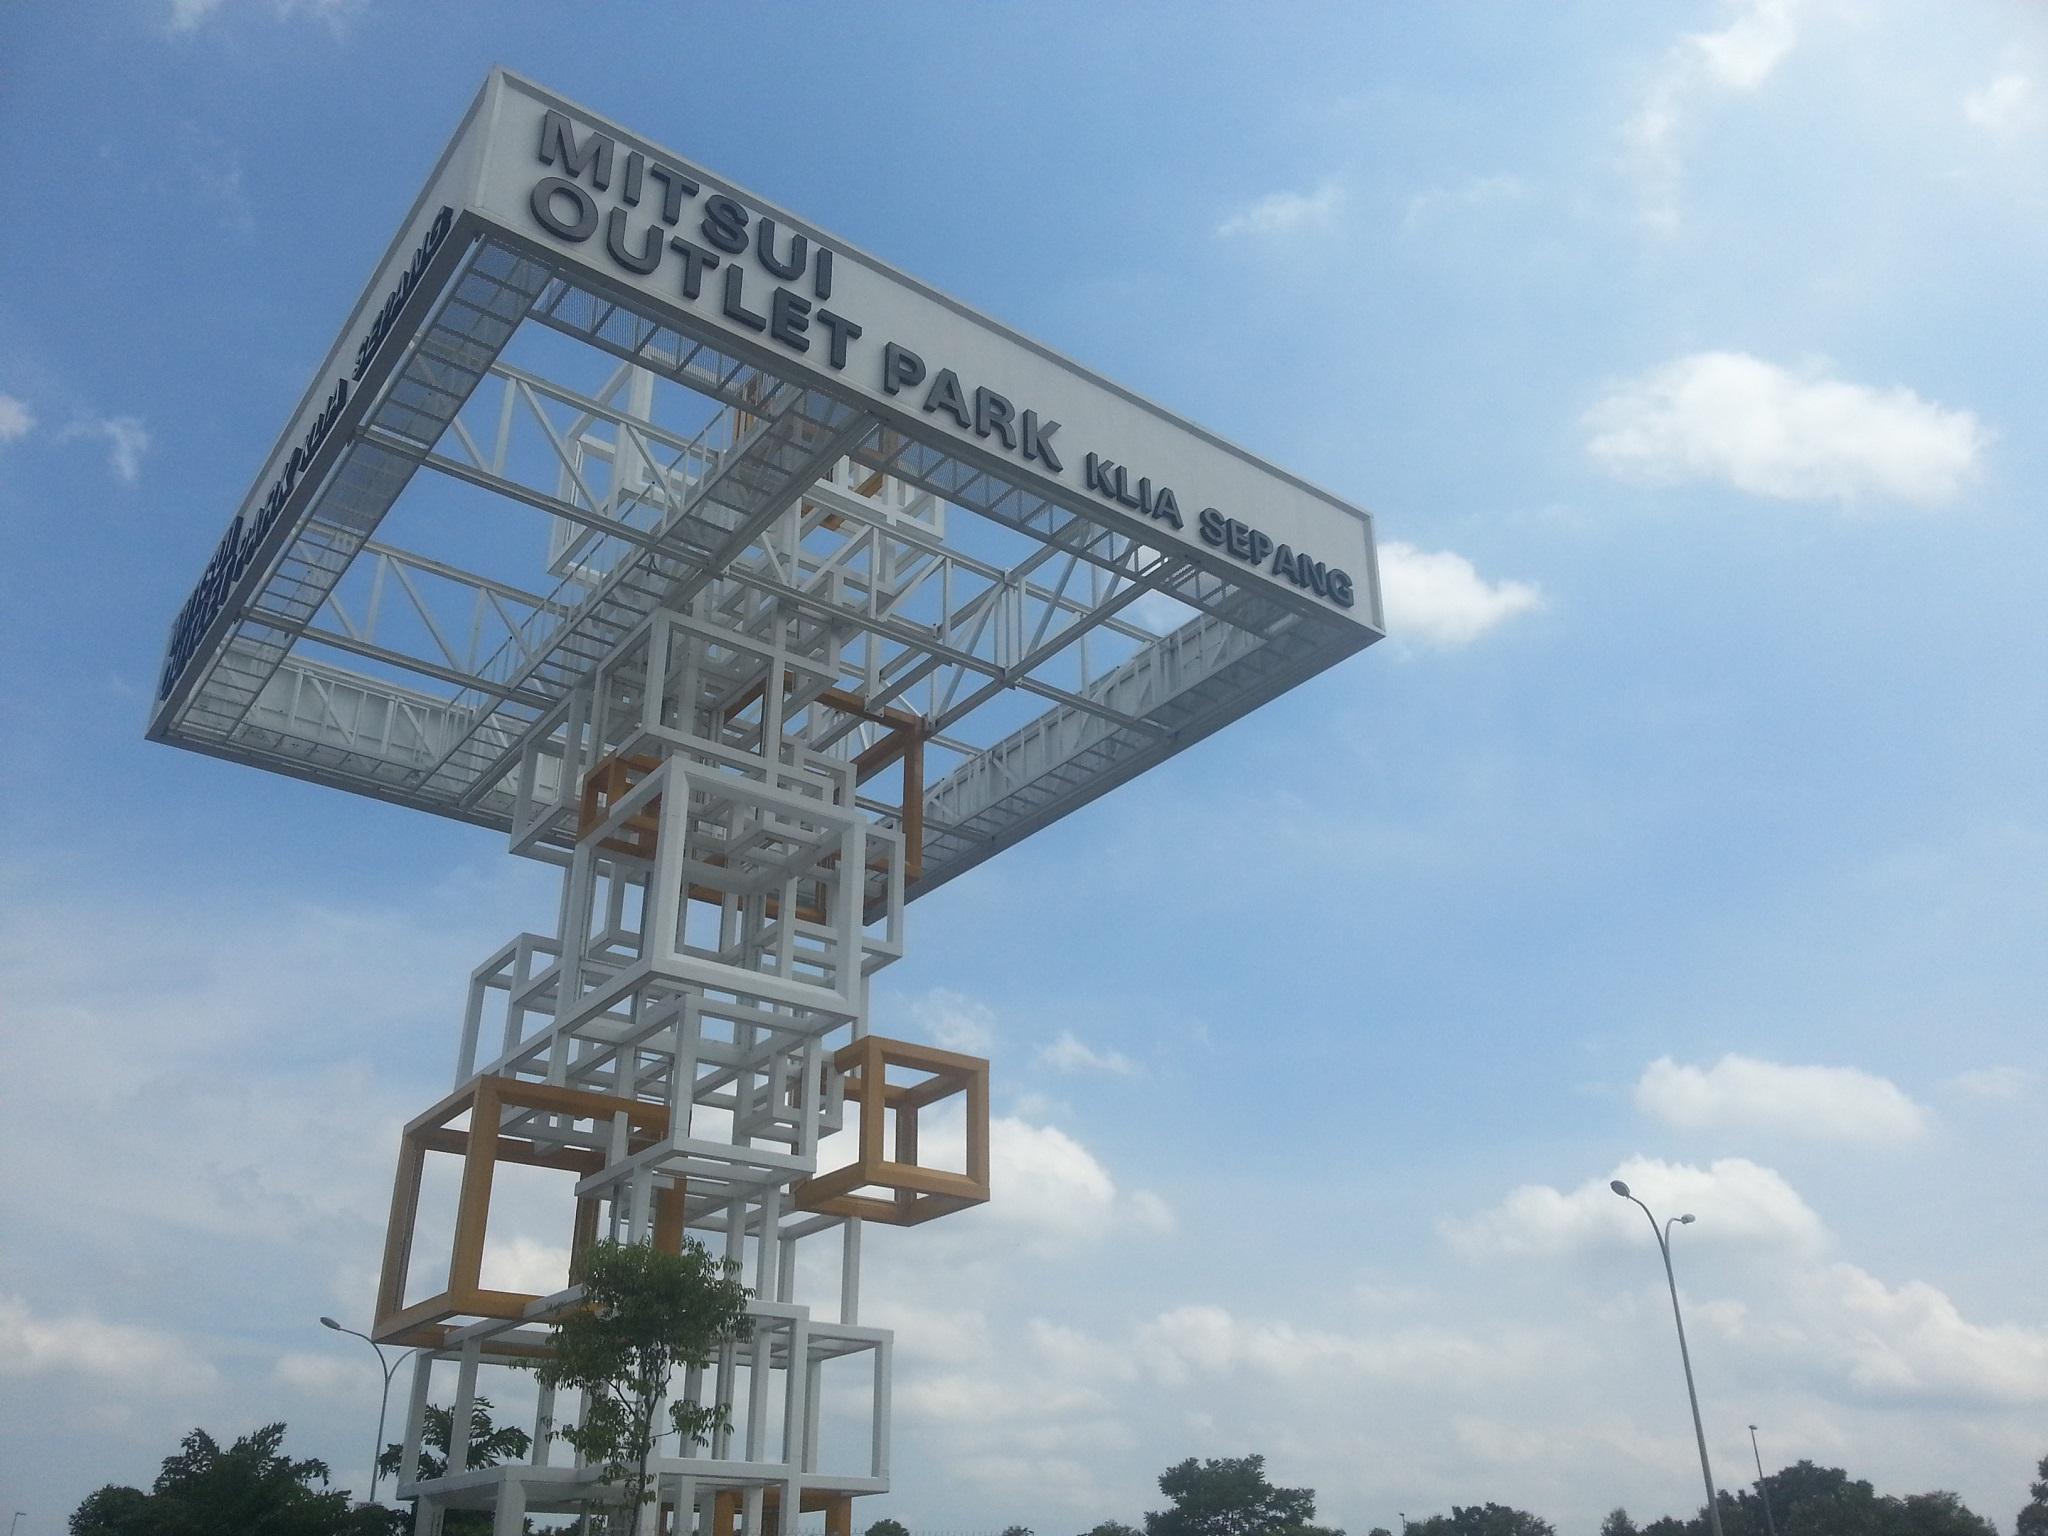 mitsui-outlet-park-klia2-sepang